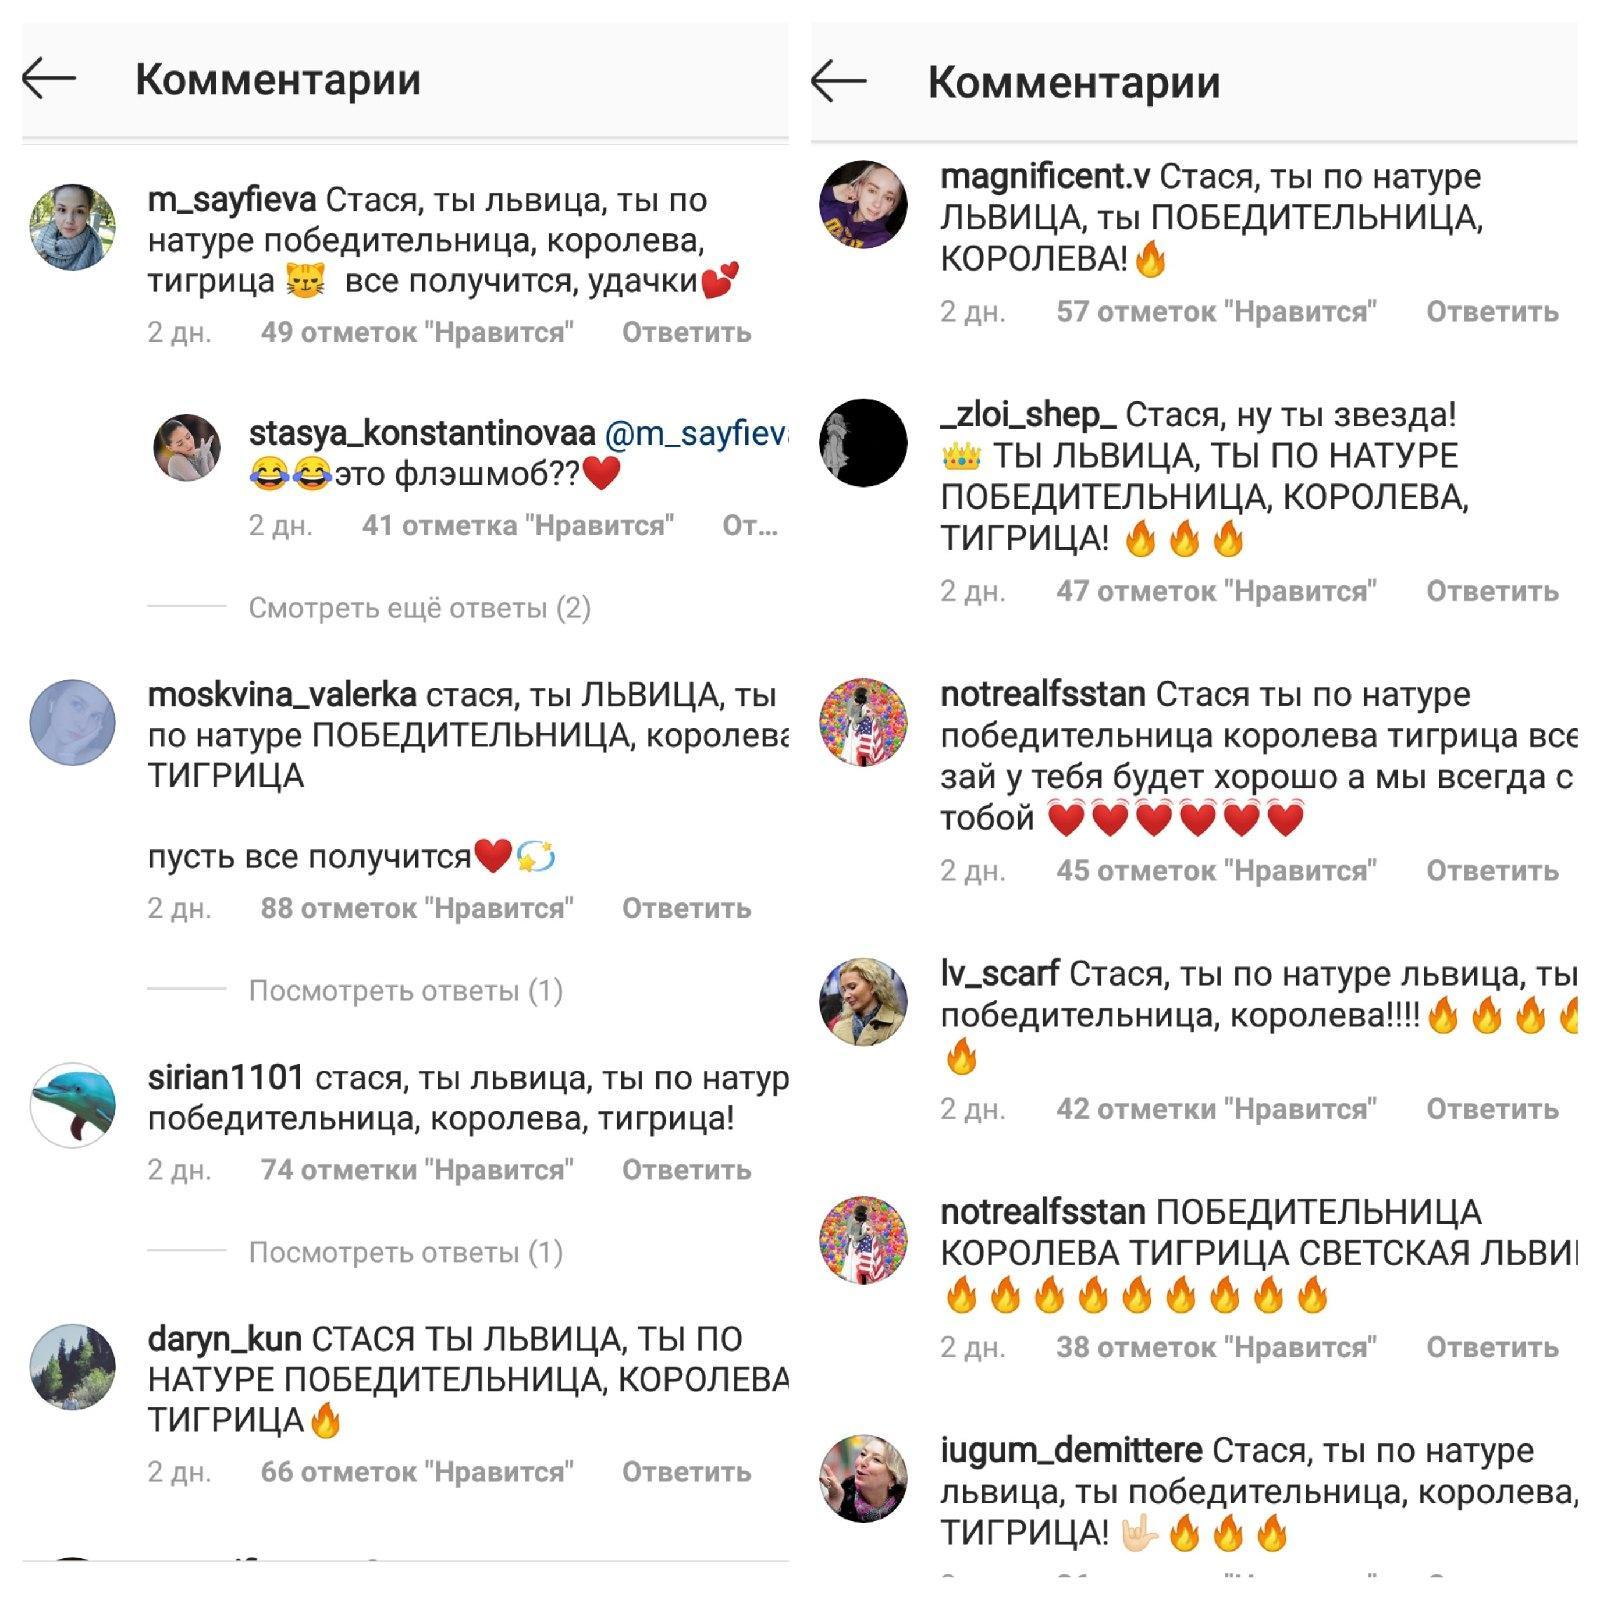 Фото © Instagram / stasya_konstantinovaa